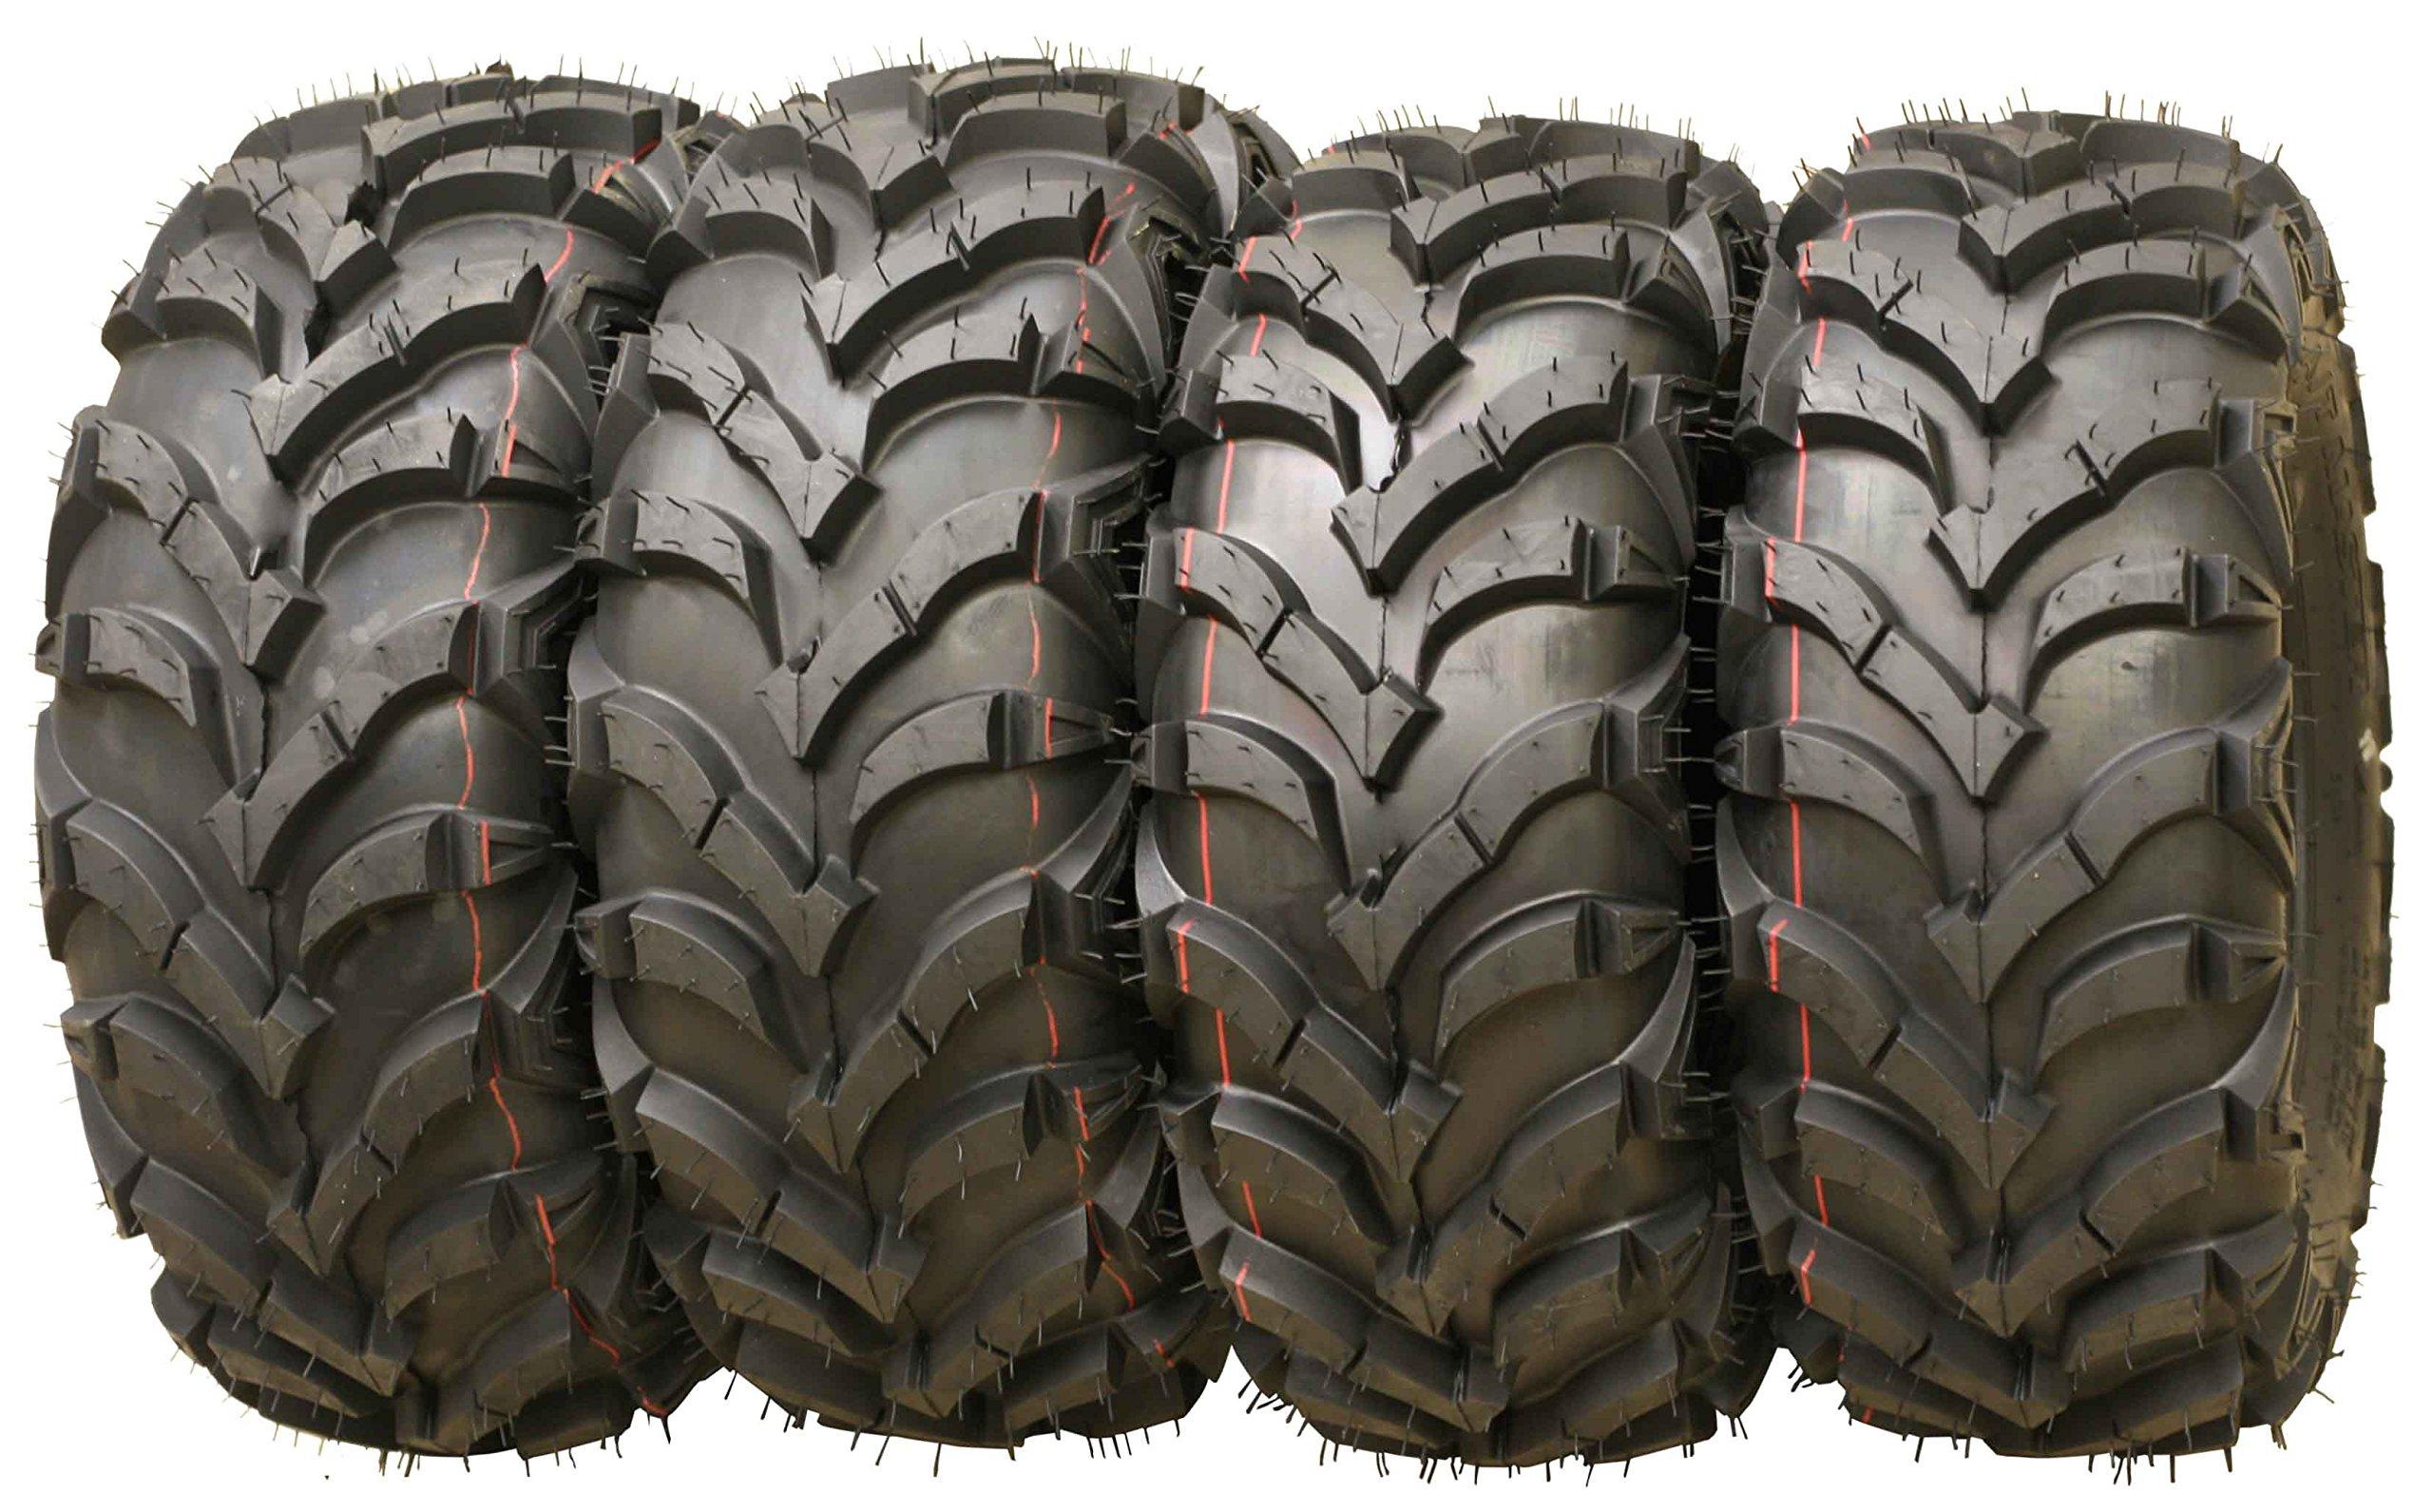 Set of 4 New ATV/UTV Tires 24x8-12 Front & 24x9-11 Rear /6PR P341 -10151/10153 …